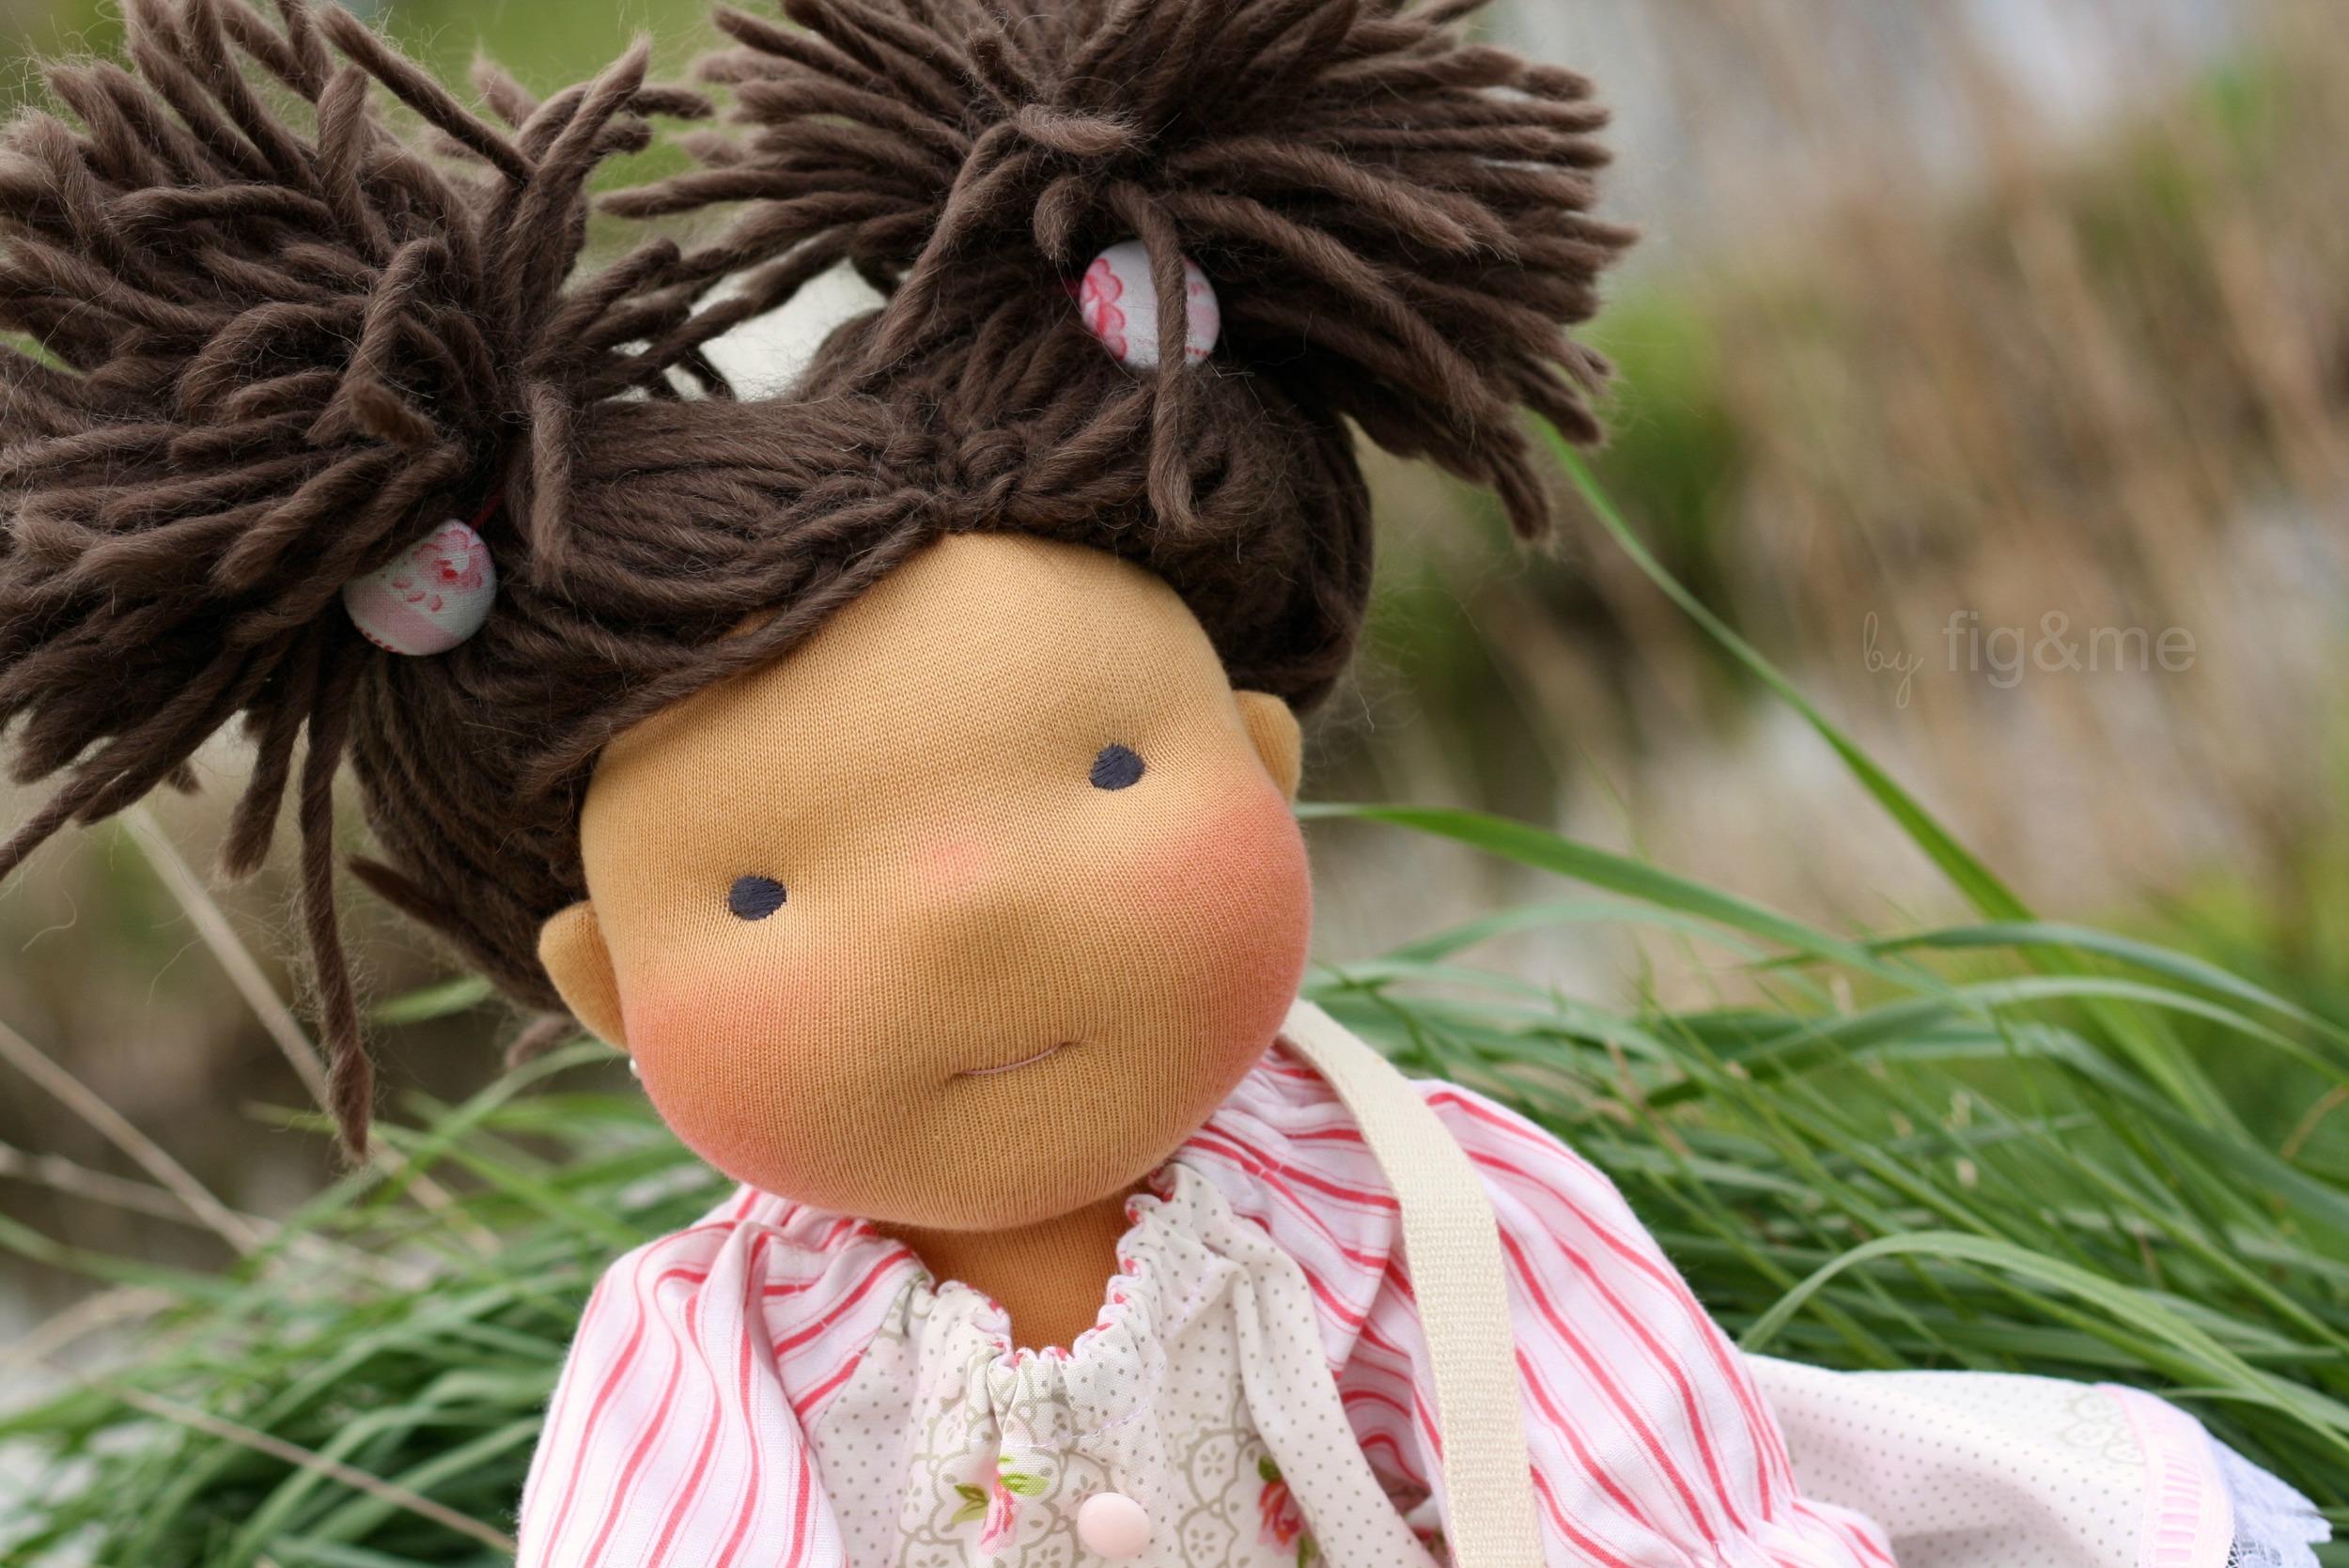 Handmade figlette doll, by figandme.